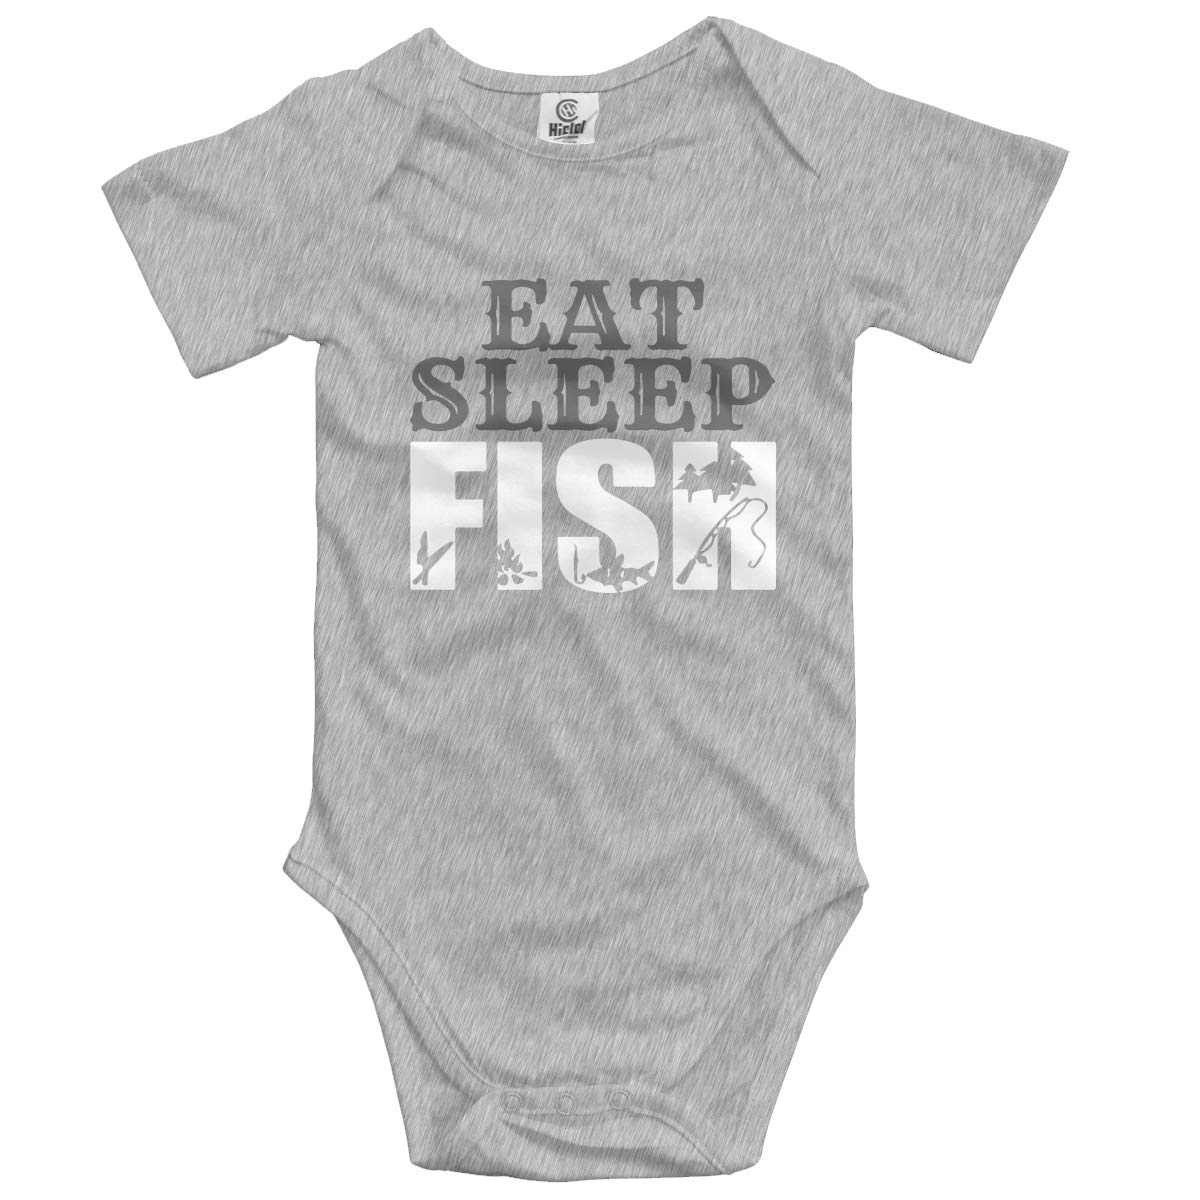 Eat Sleep Fish 2-1 Baby Boys Or Girls 100/% Organic Cotton Layette Bodysuit 0-24M